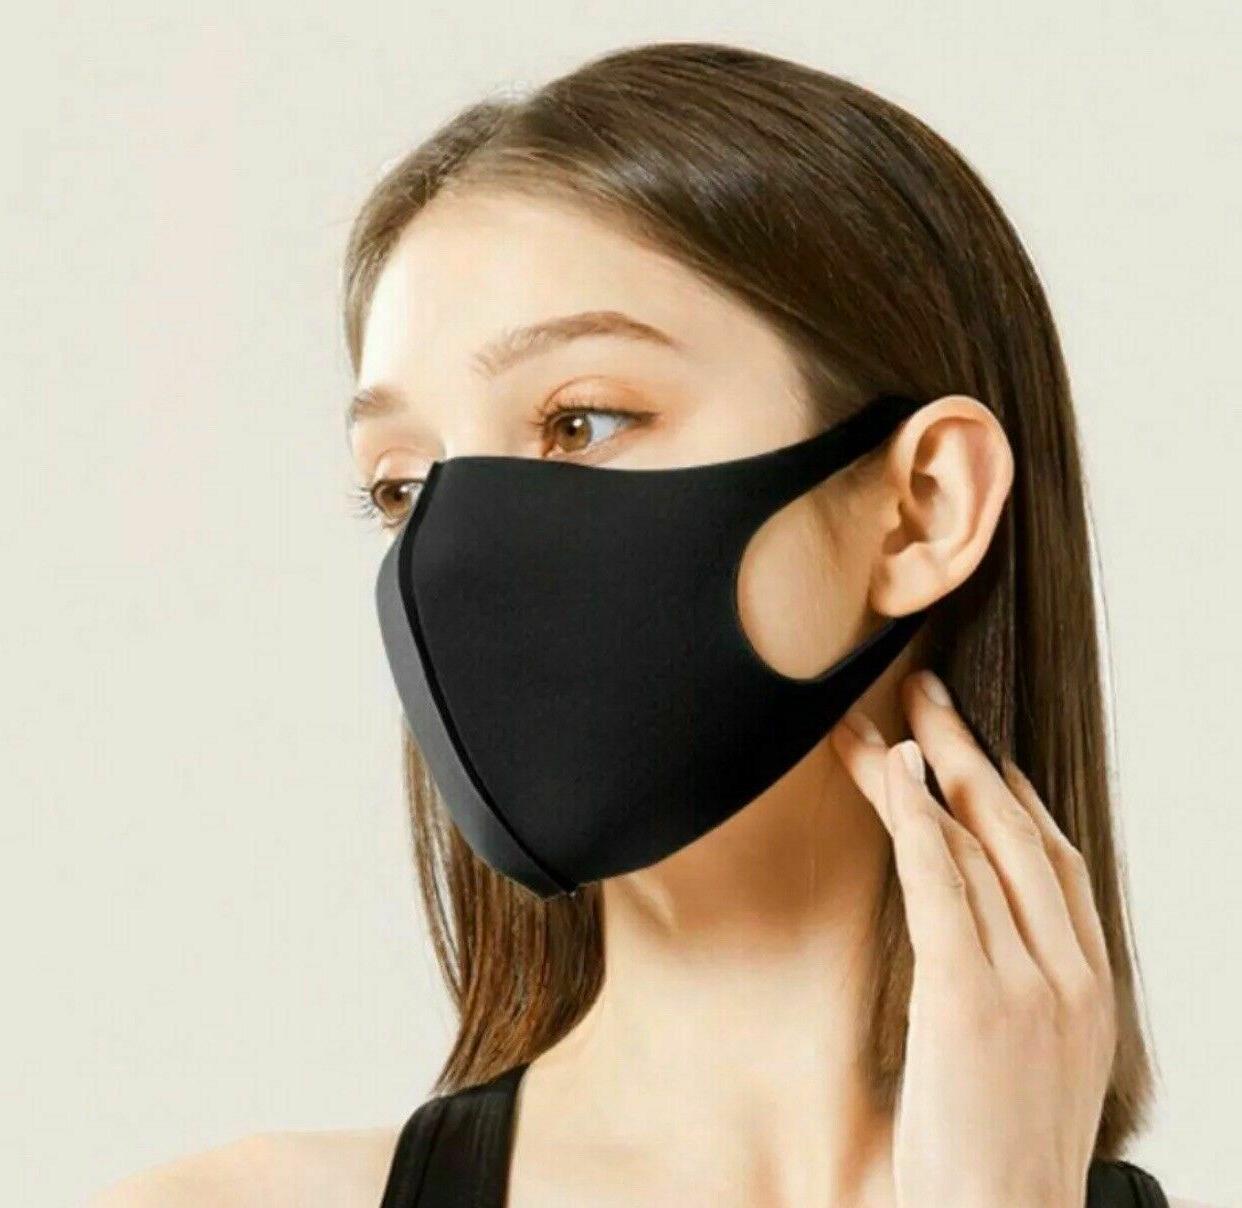 6 PCS Reusable Mask Breathable COOL Shipping